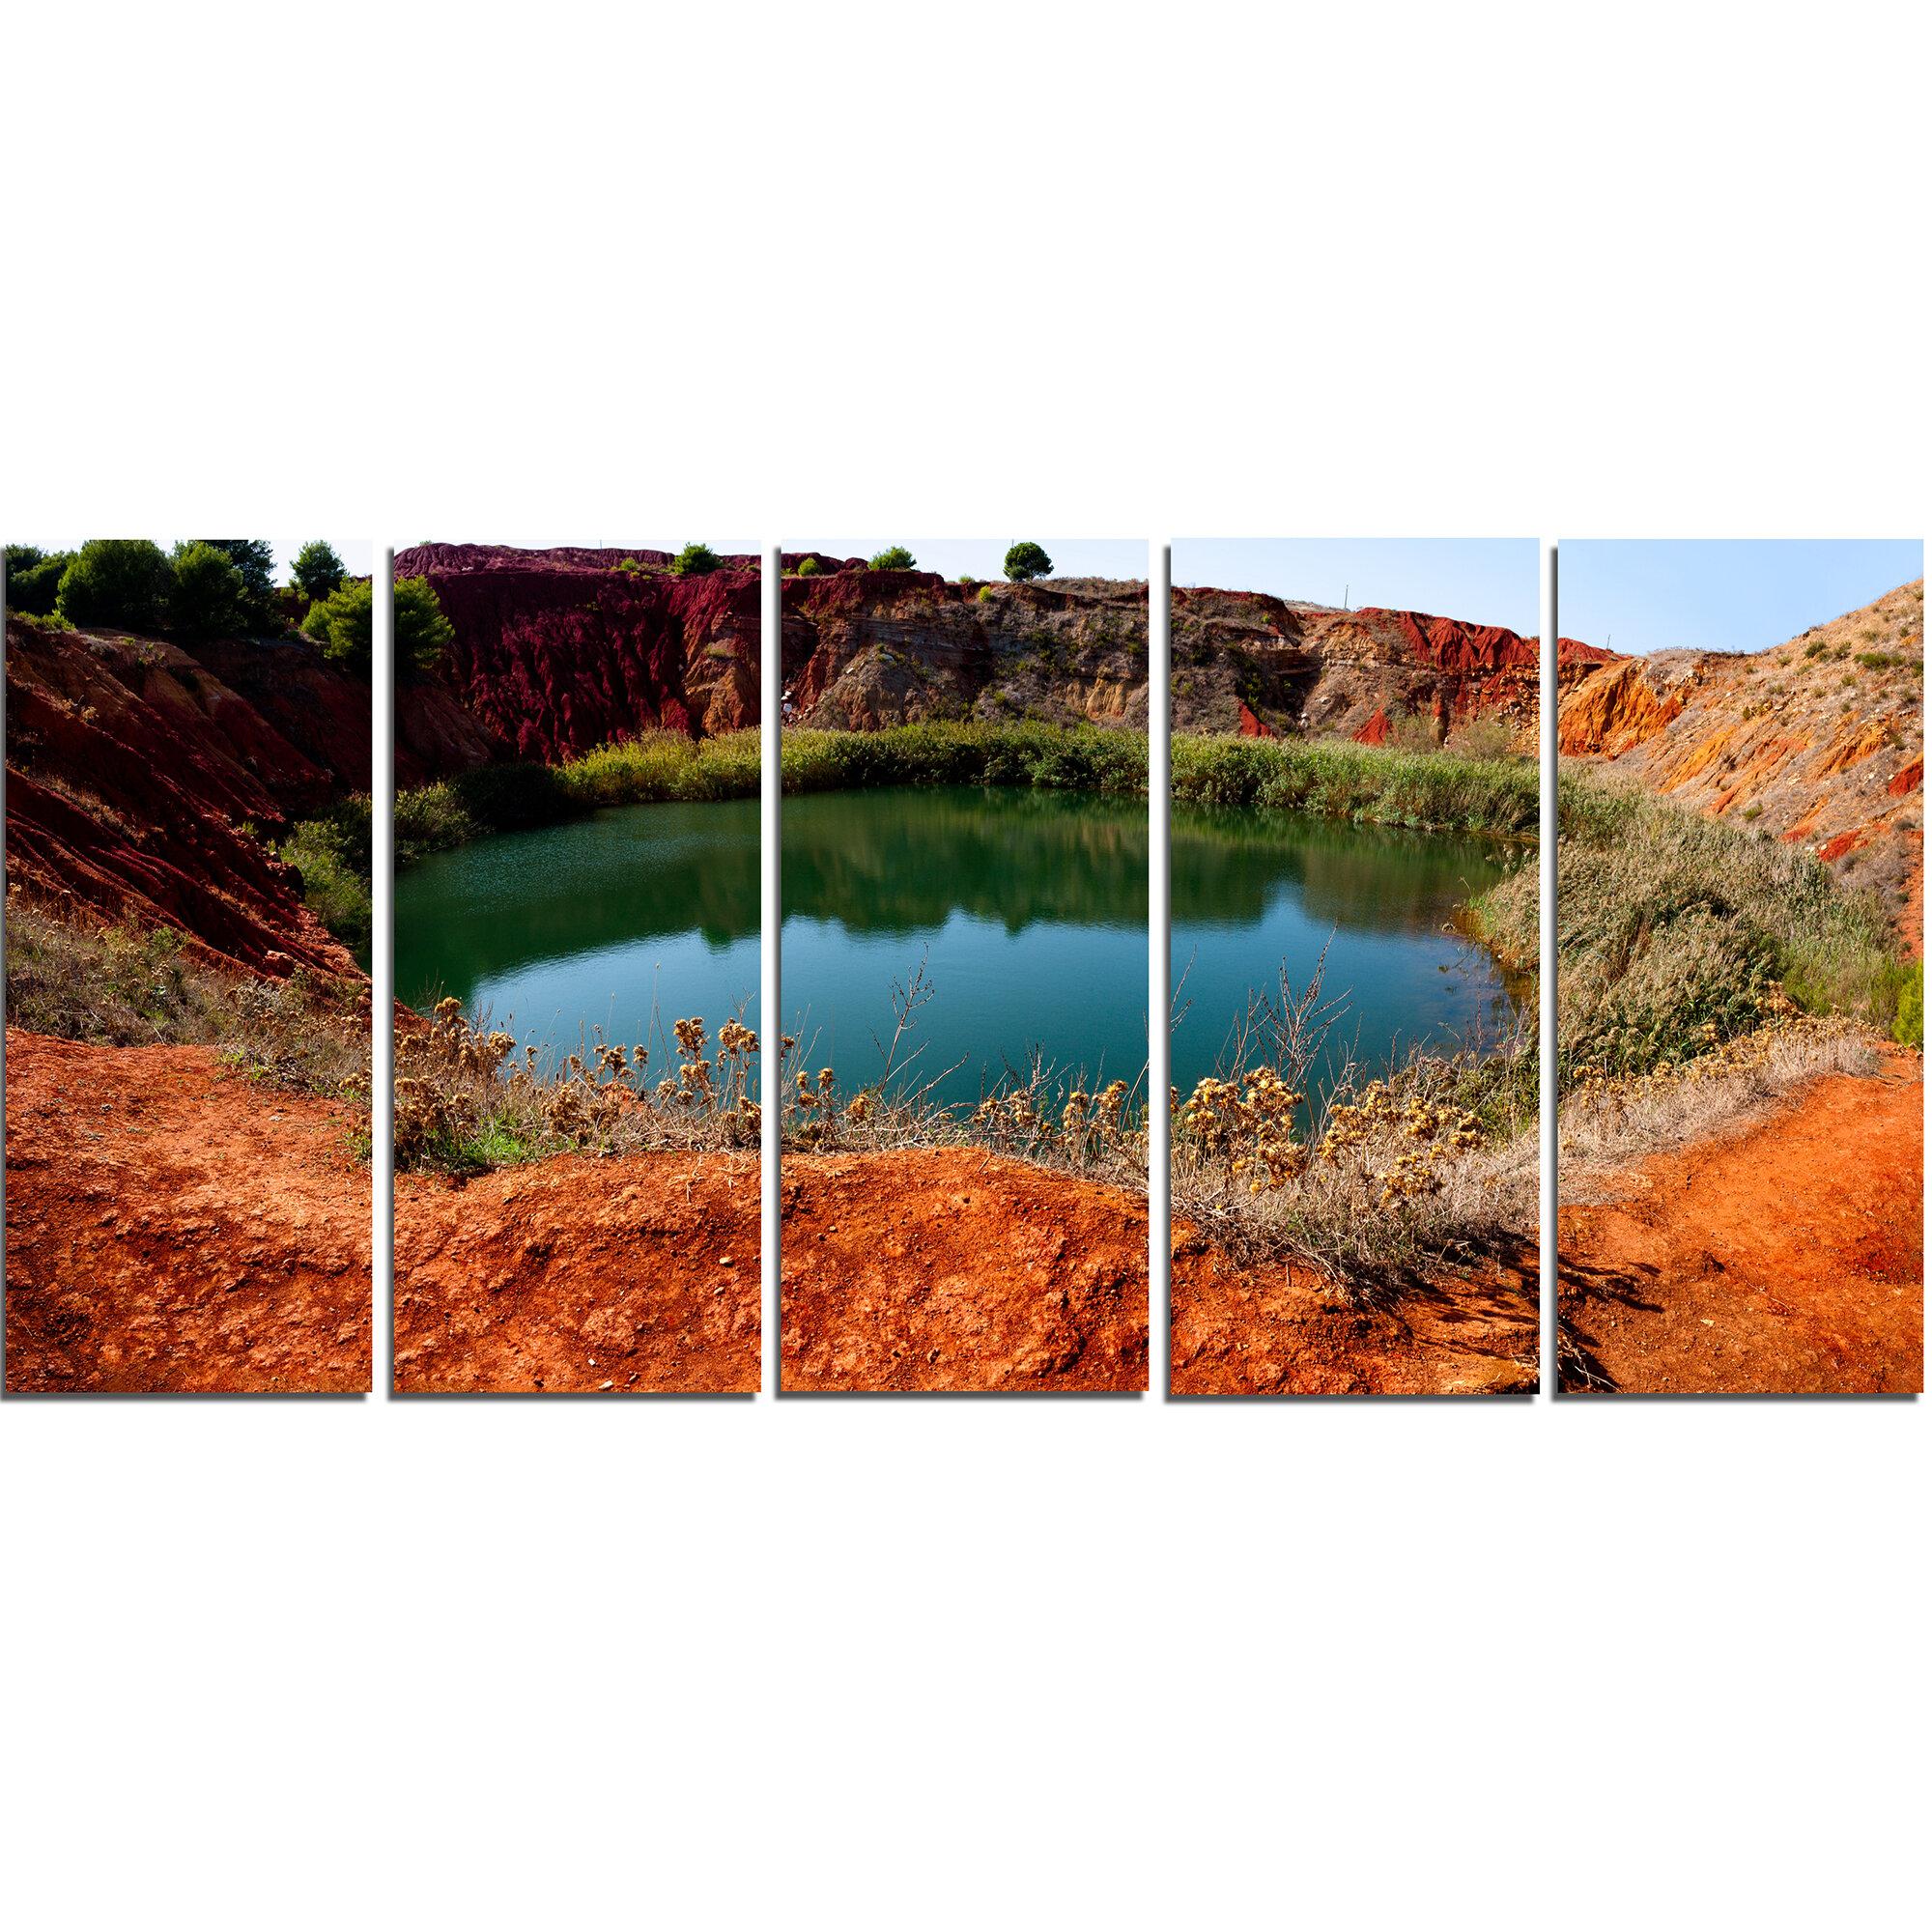 Designart Bauxite Mine With Lake 5 Piece Wall Art On Wrapped Canvas Set Wayfair